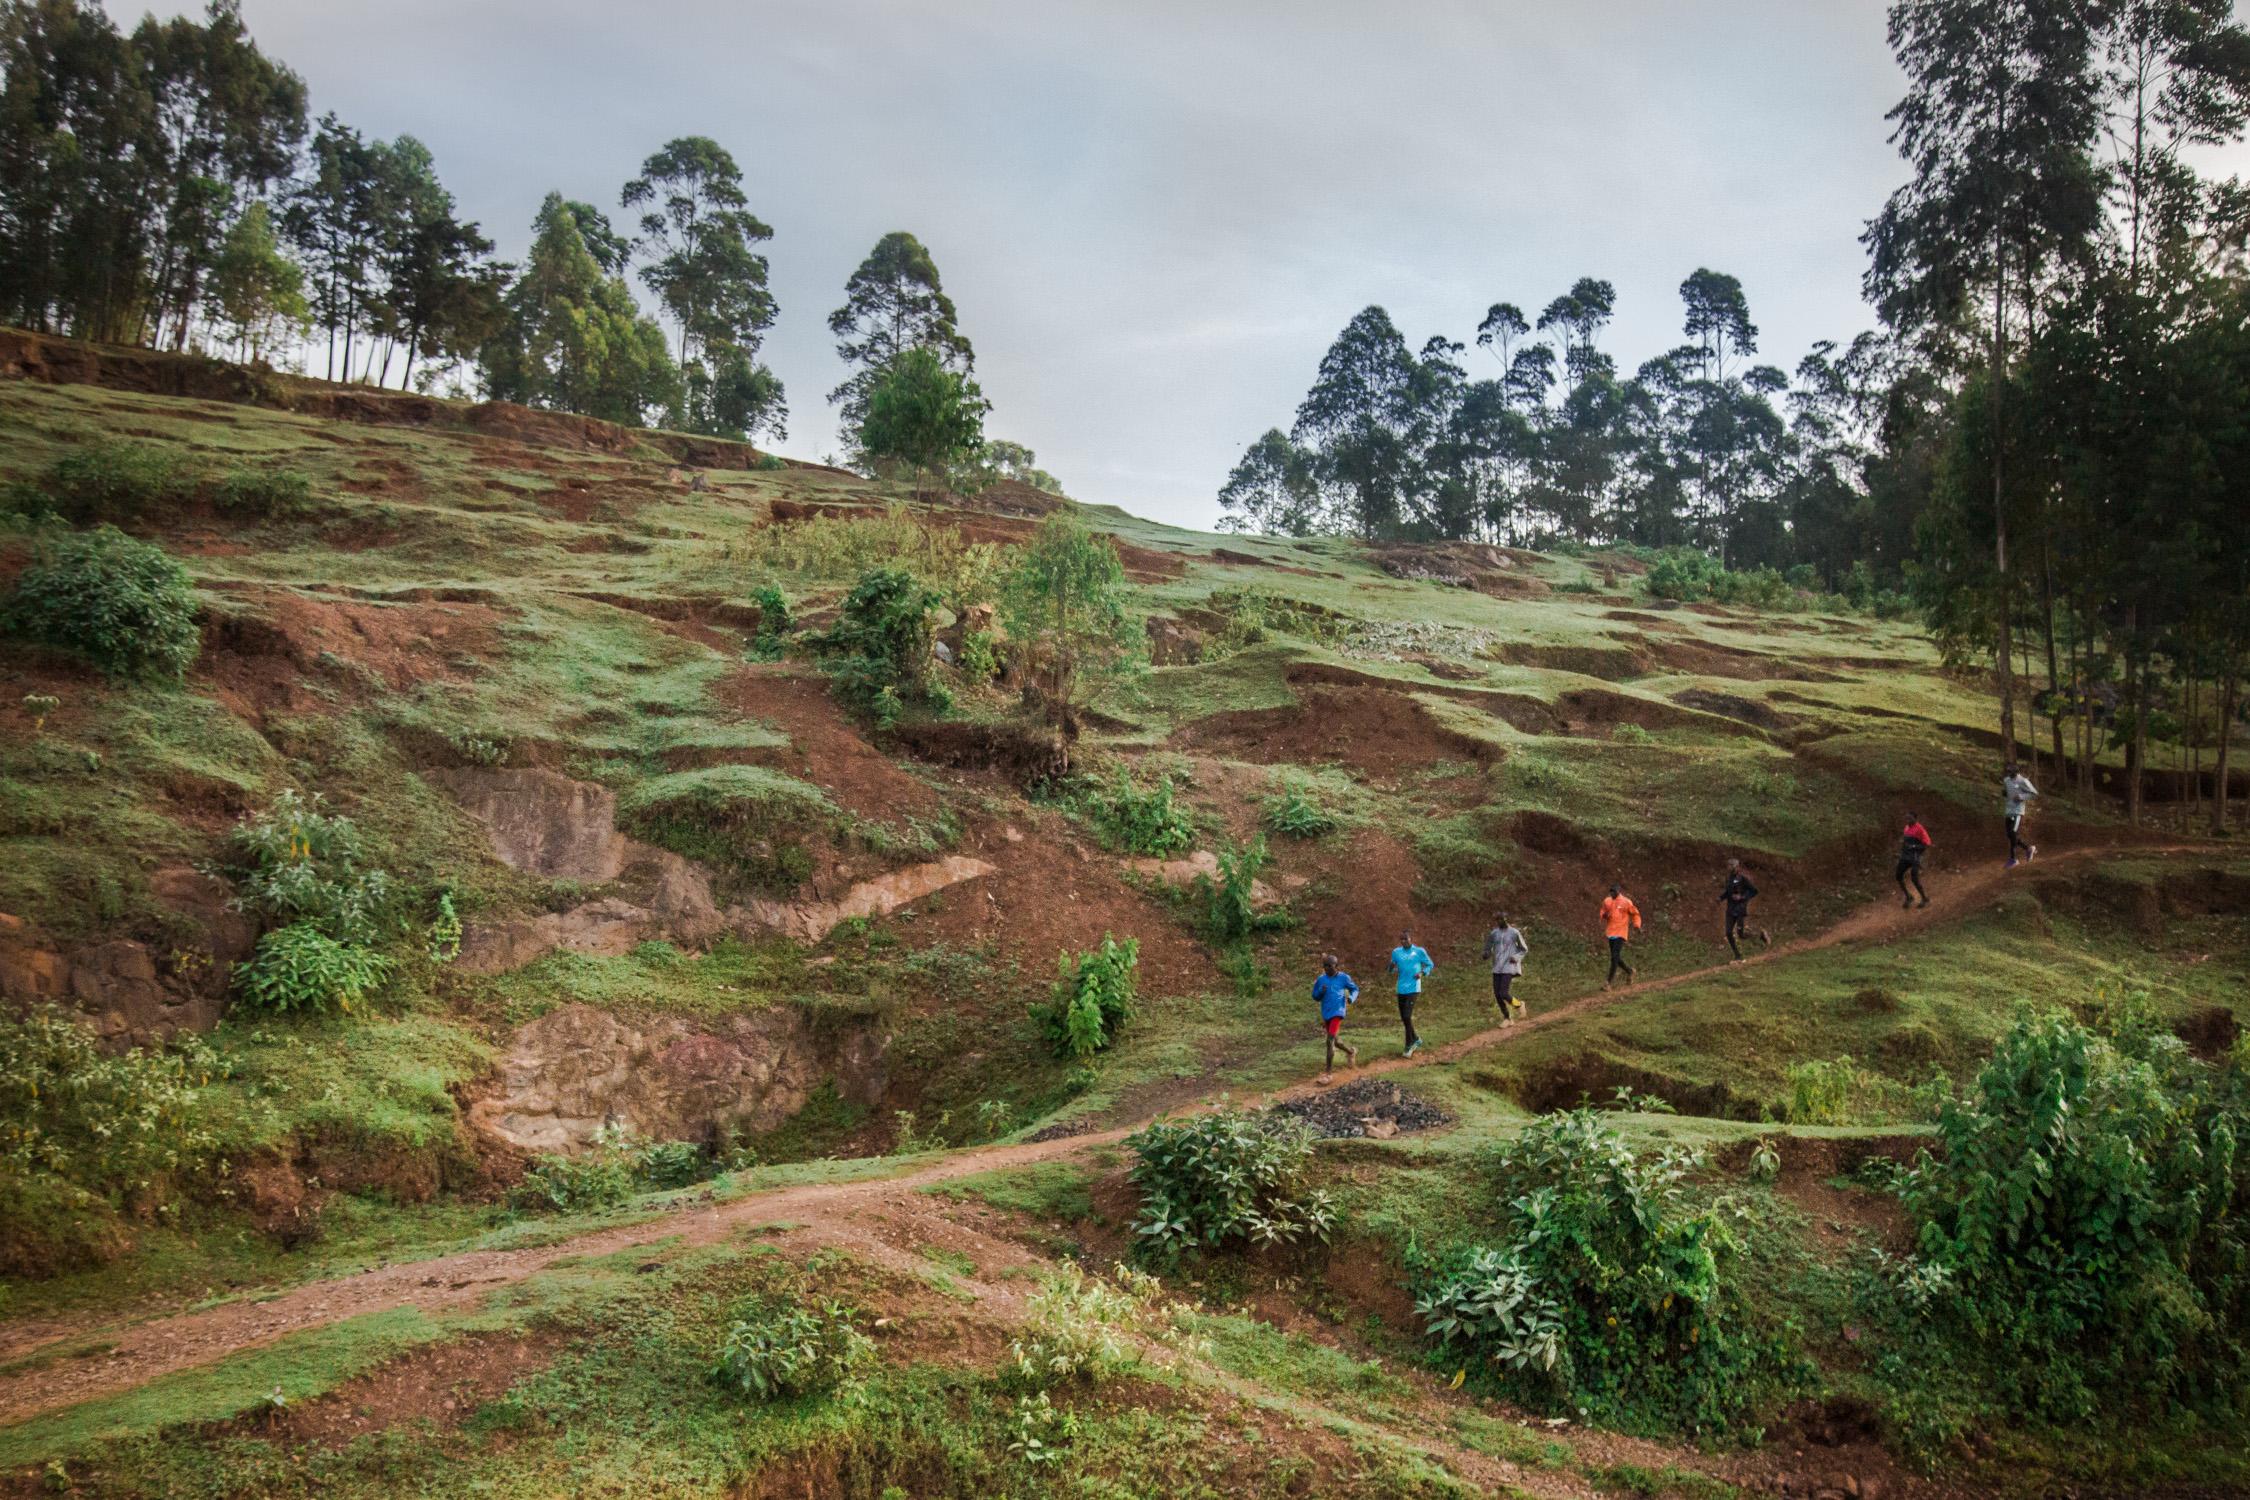 Paul Koech's team training in the highland of the Rift Valley in Kenya.